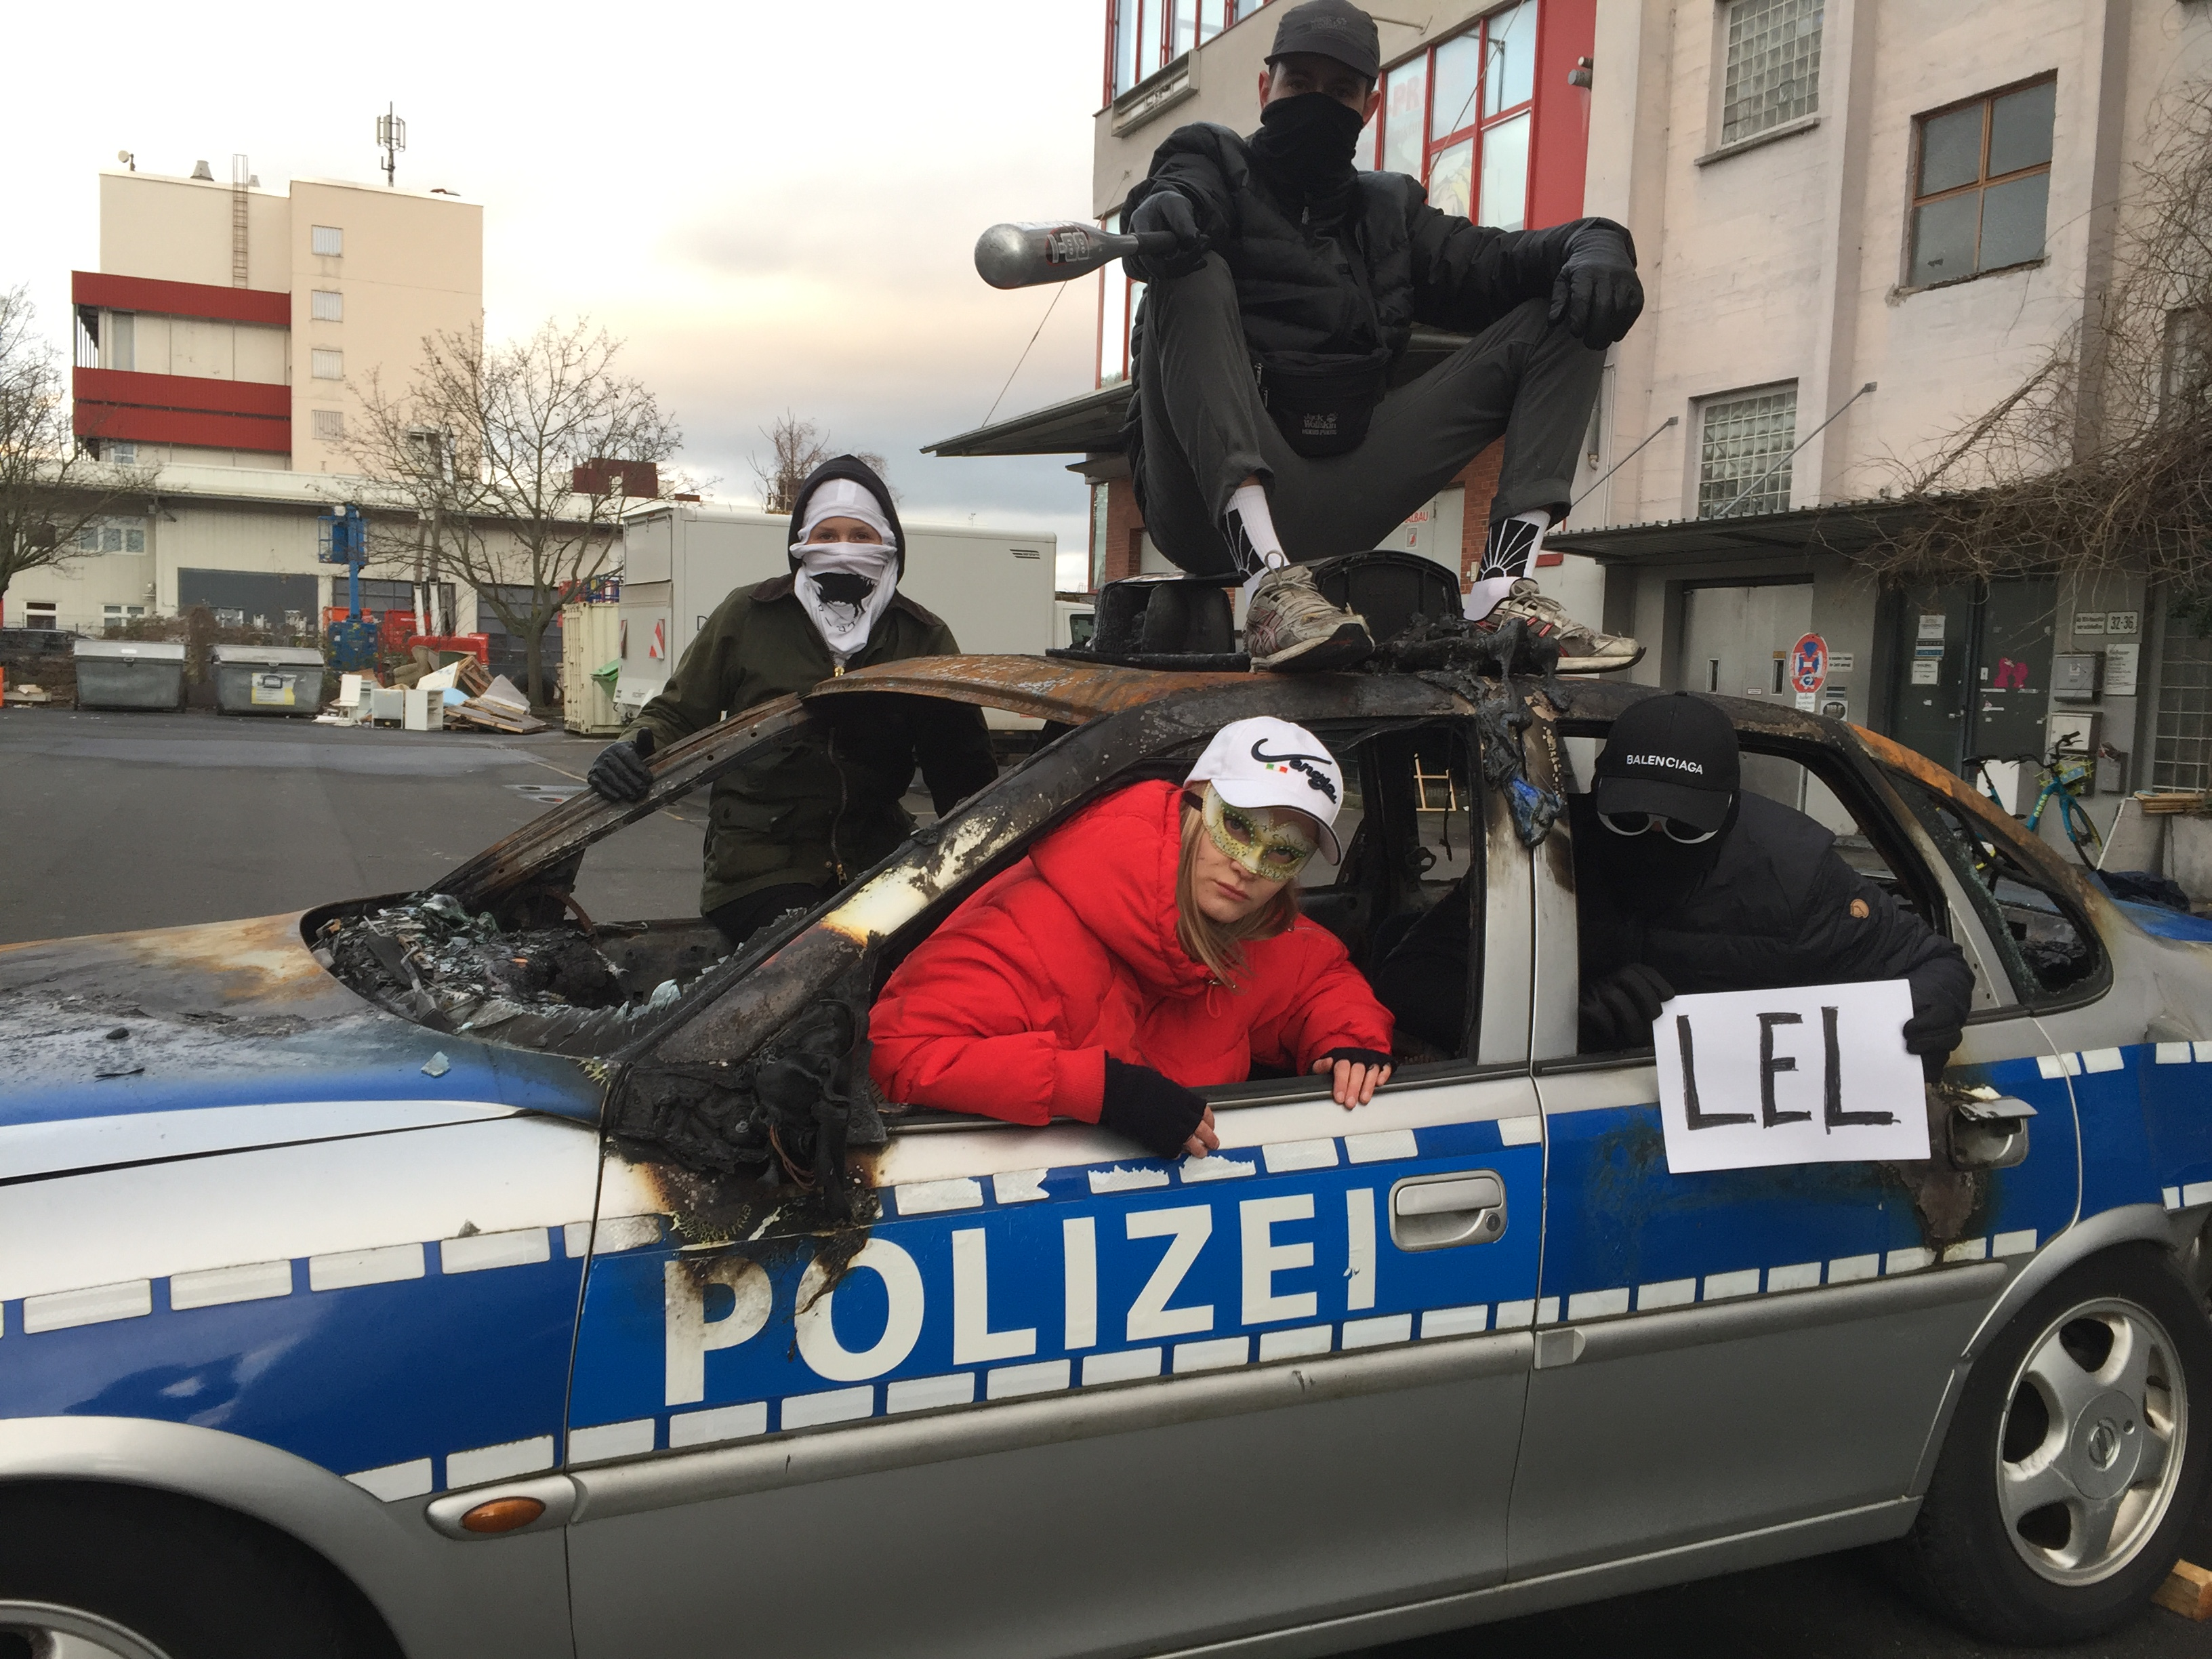 FRANKFURT CREATIVE SCENE ART MUSIC CULTURE ACTIVISM GENTRIFICATION CAPITALISM BREXIT PROTEST LGBTQ FEMINISM QUEER POC